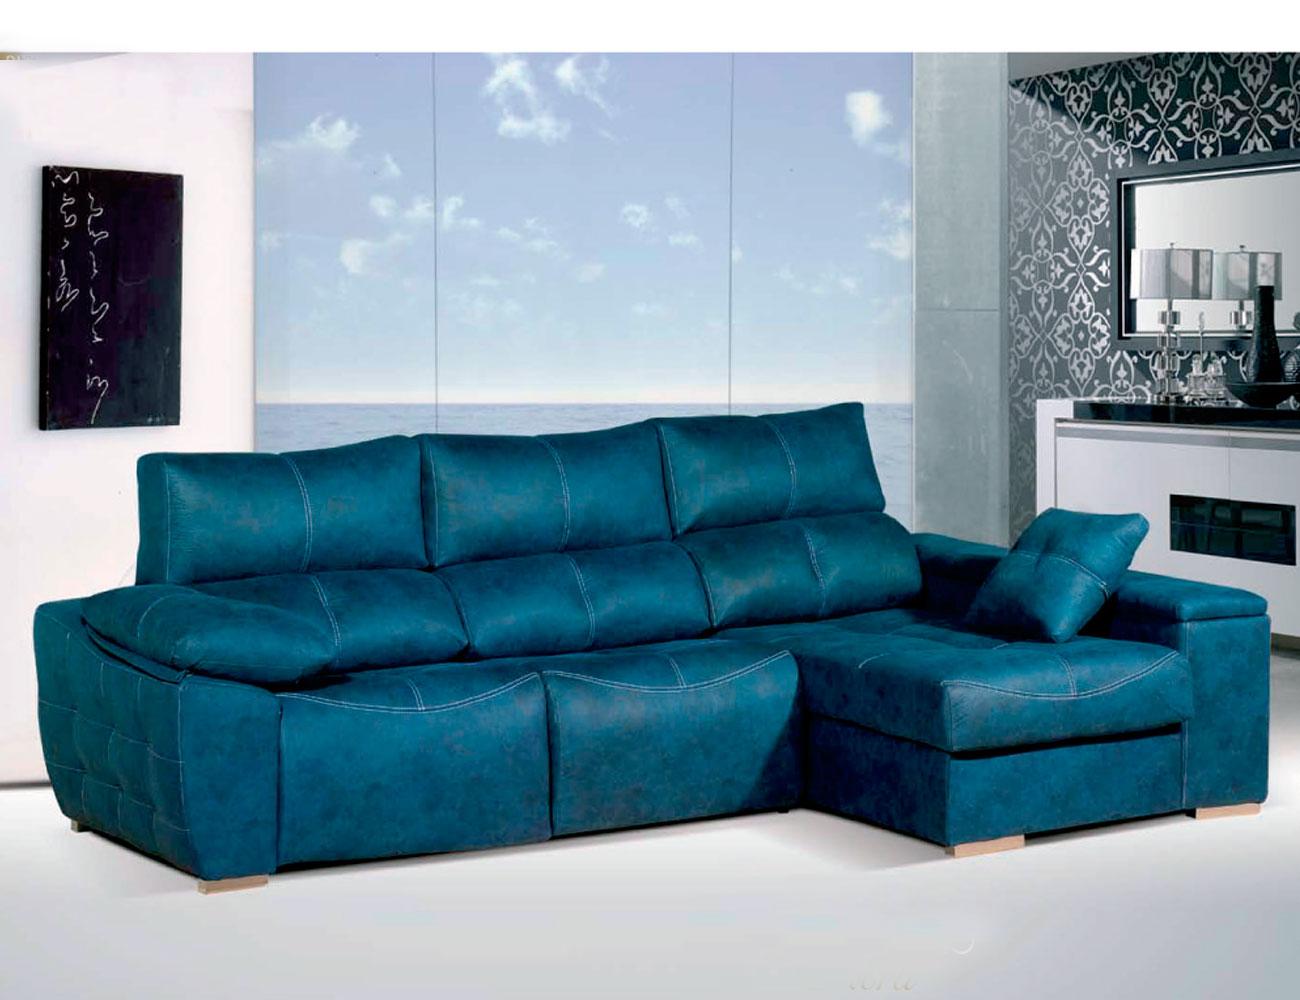 Sofa chaiselongue relax 2 motores anti manchas turquesa18